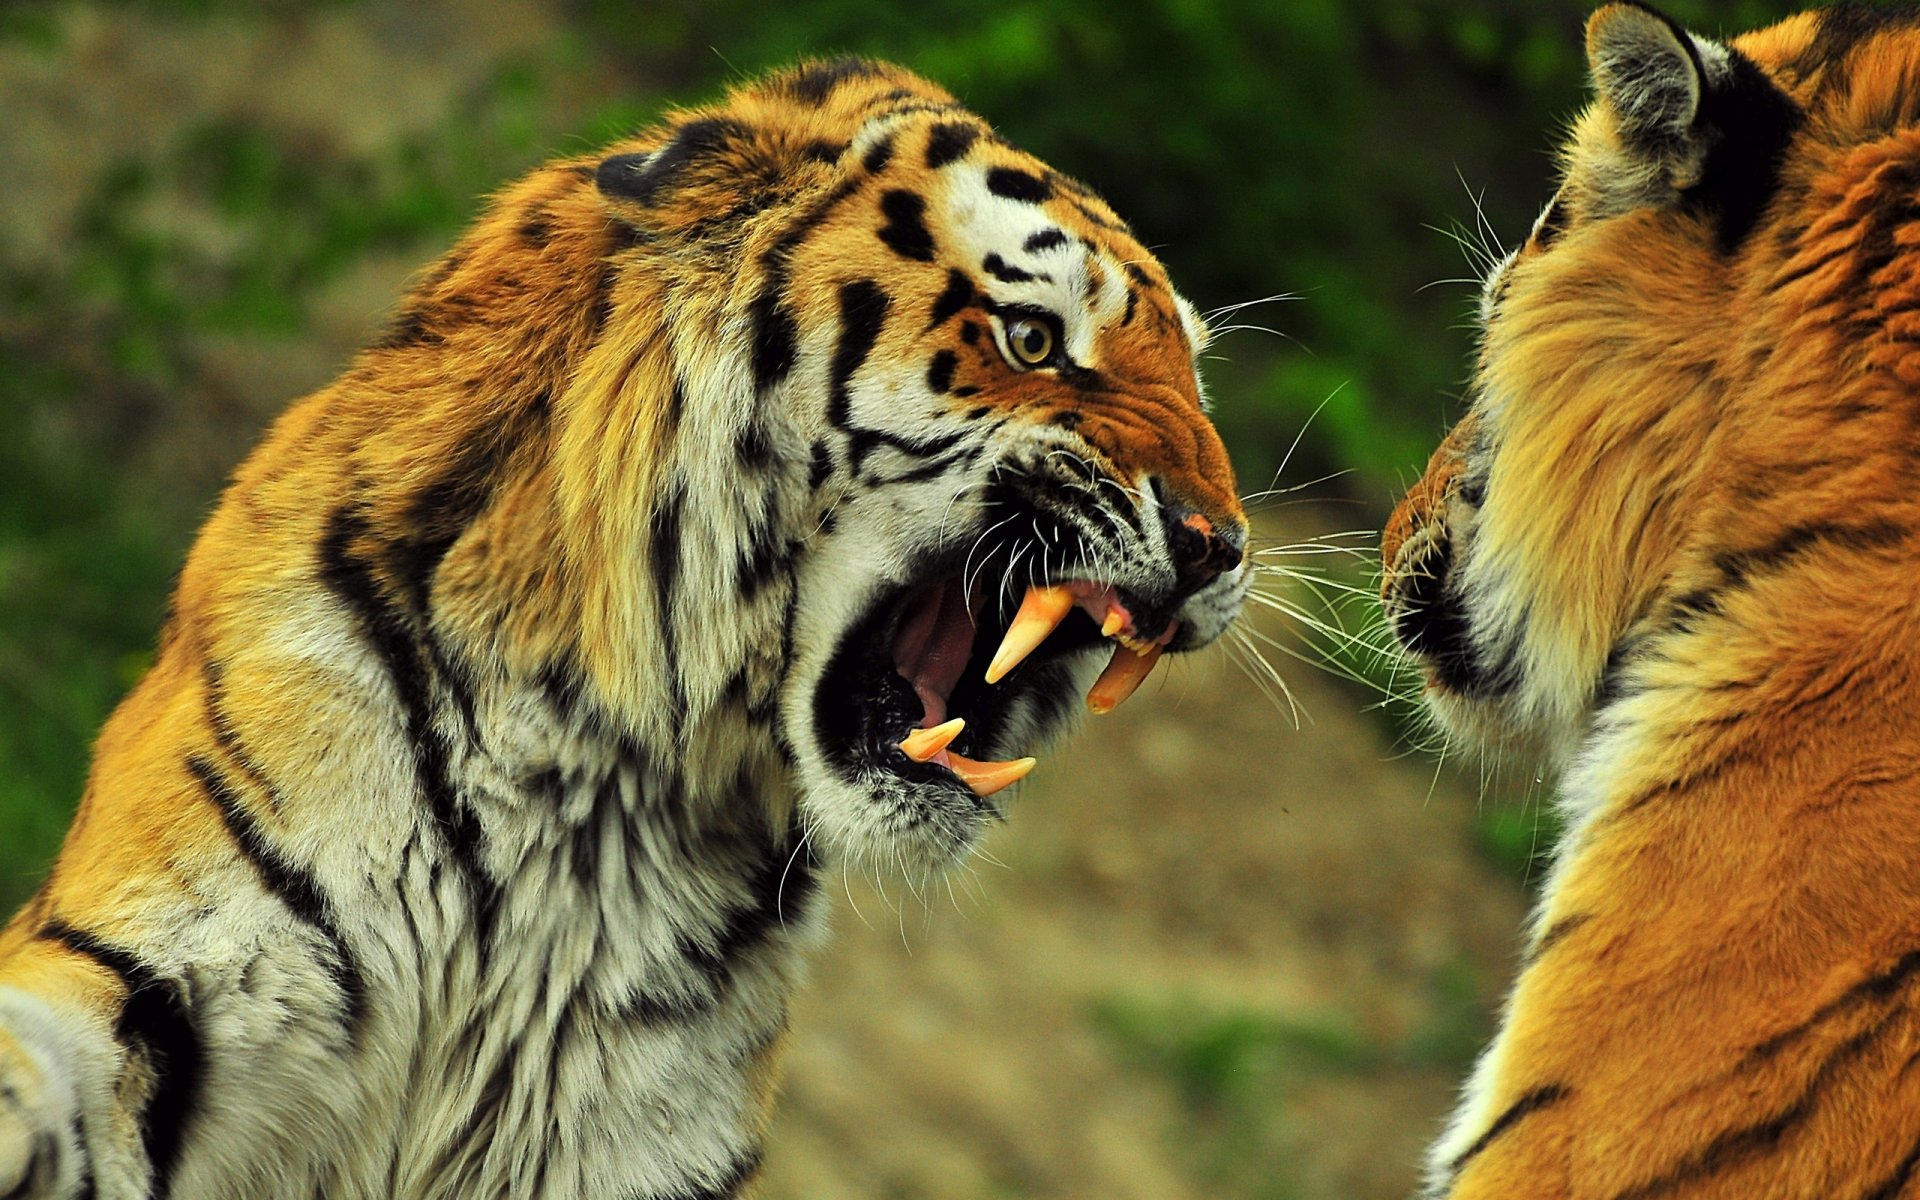 Safari Park - Official Site Pictures of lions tigers